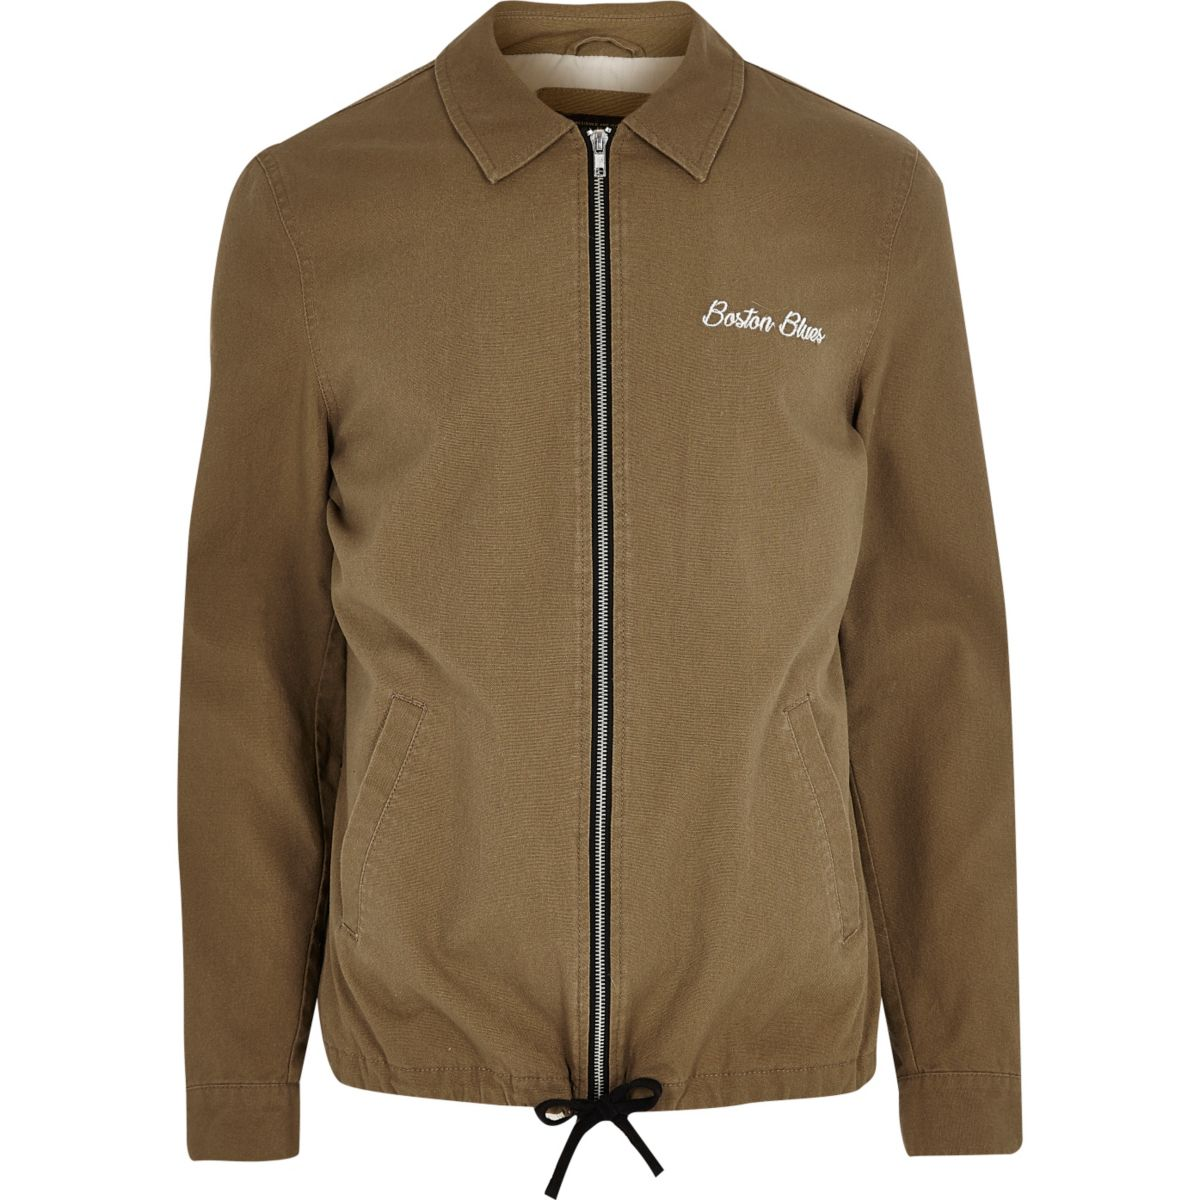 Brown 'Boston' embroidered harrington jacket